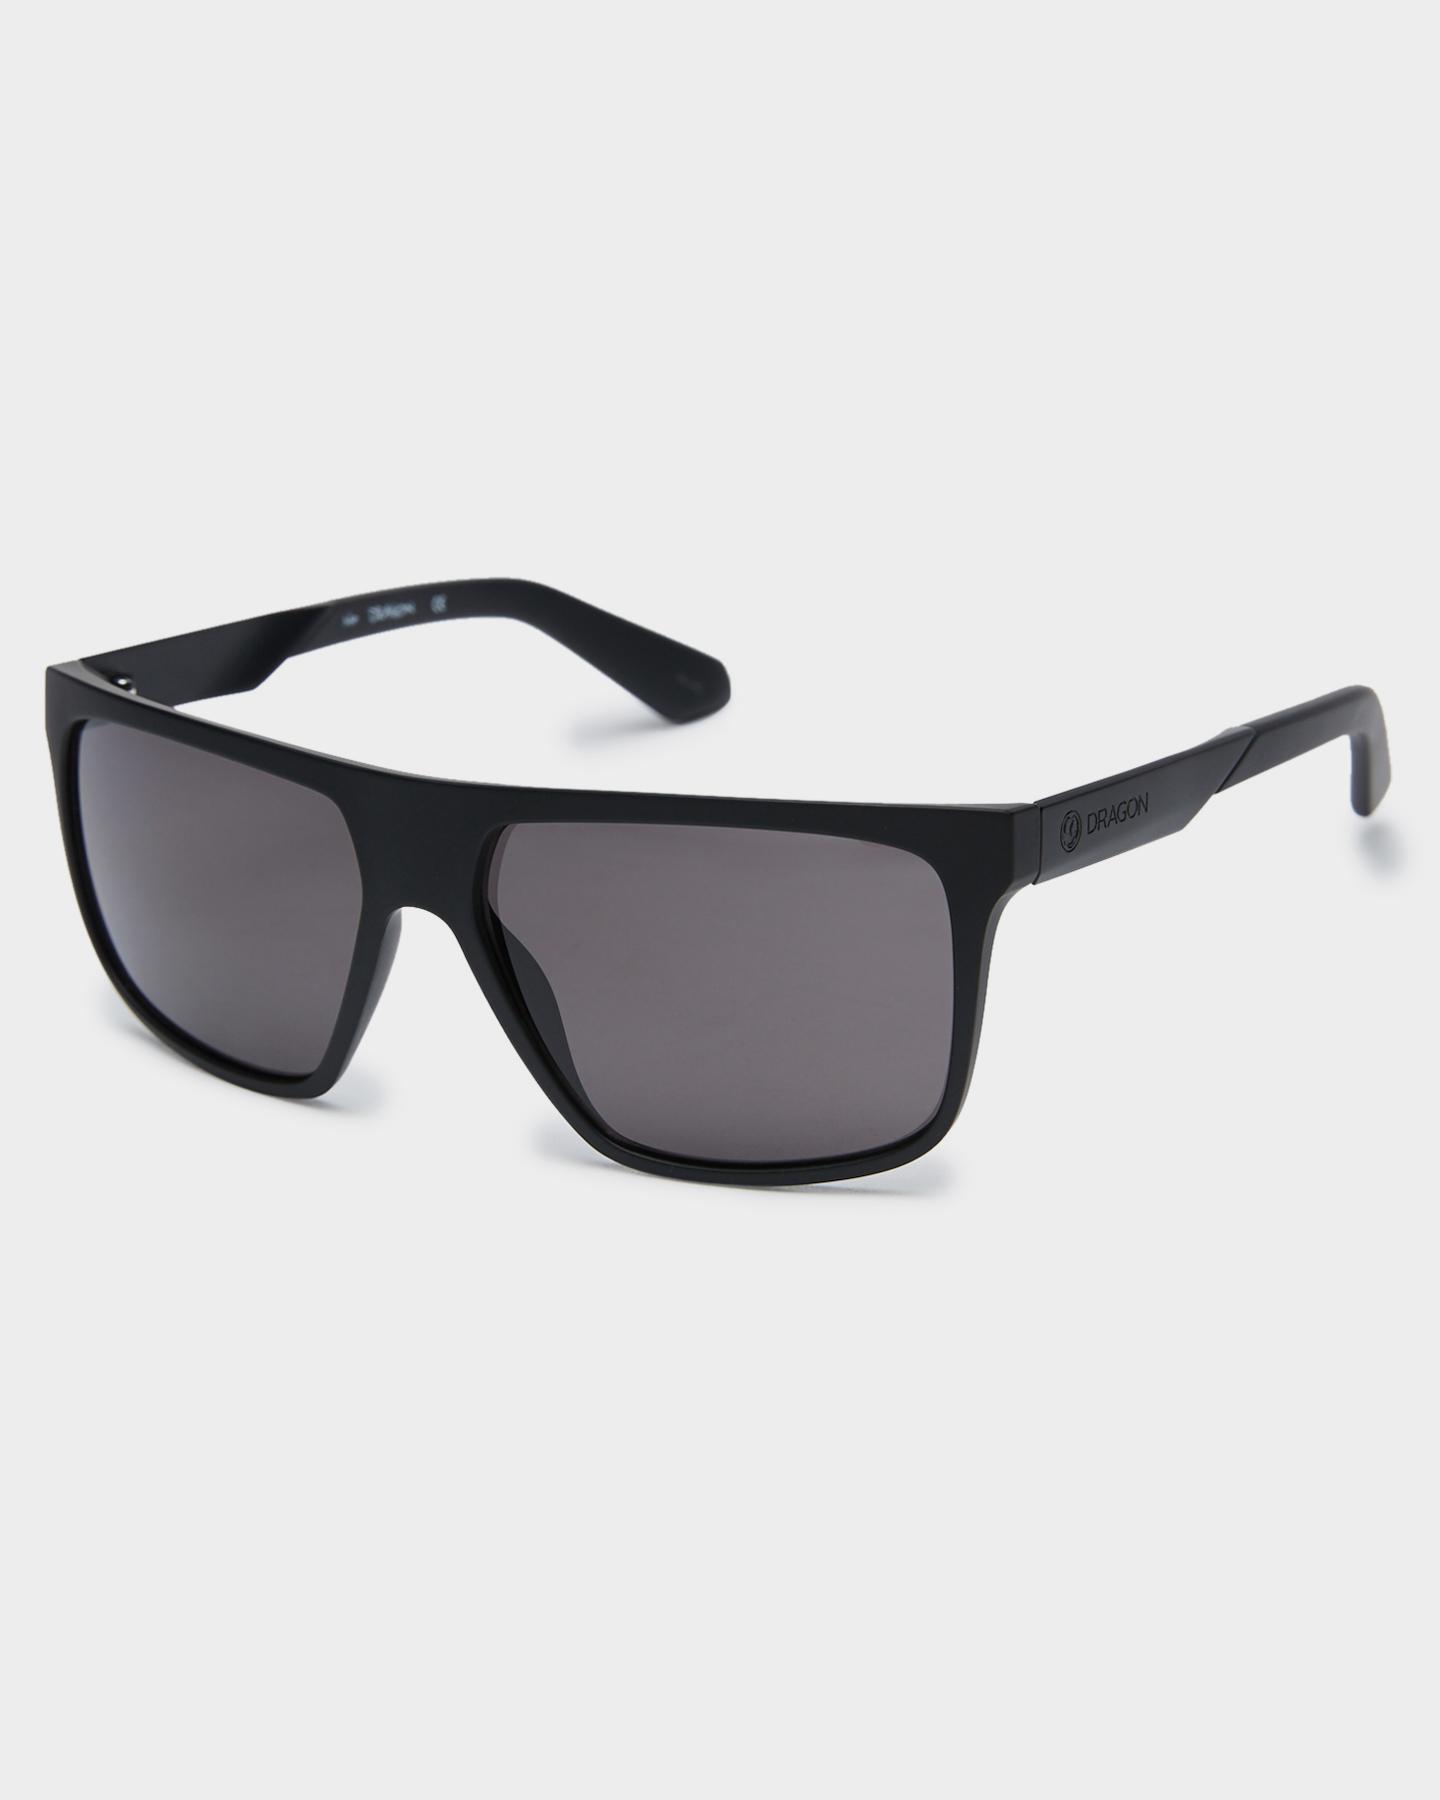 Dragon Vinyl Polarized Sunglasses Matte Black Smoke